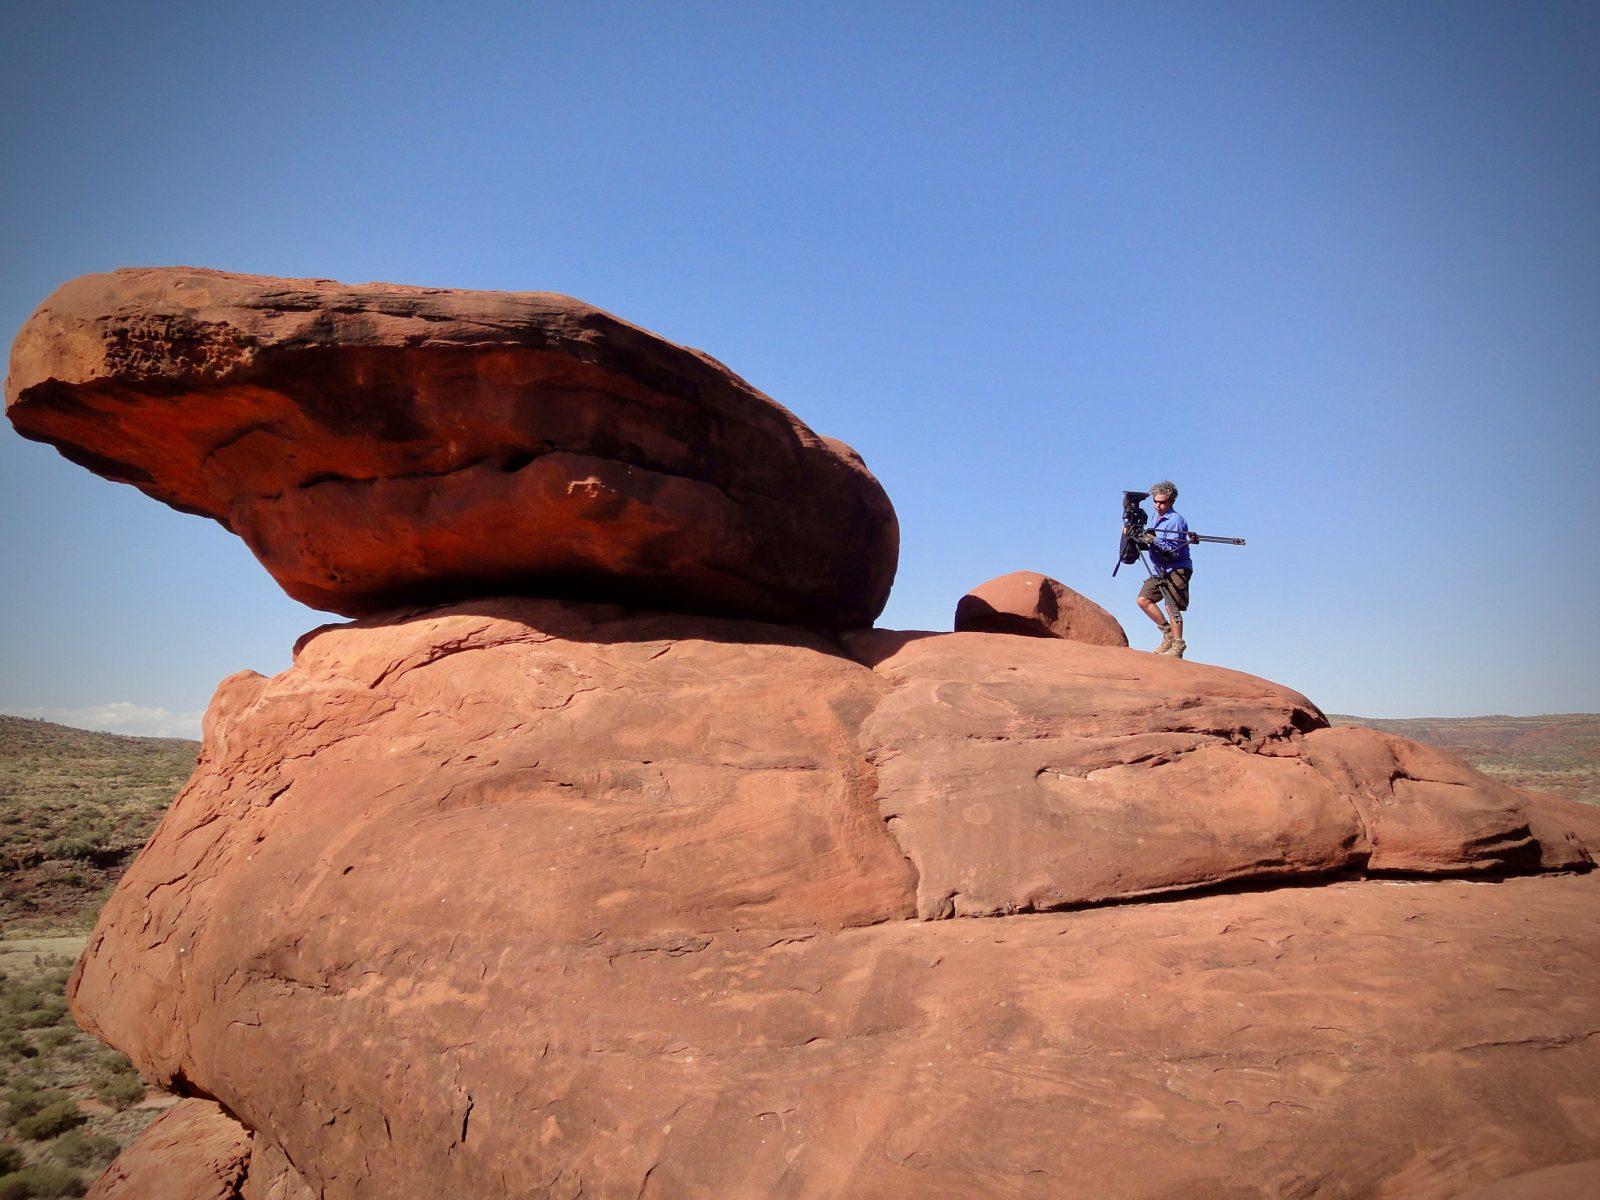 jens-westphalen-palm-valley-outback-australia-zorillafilm-grospitz-westphalen